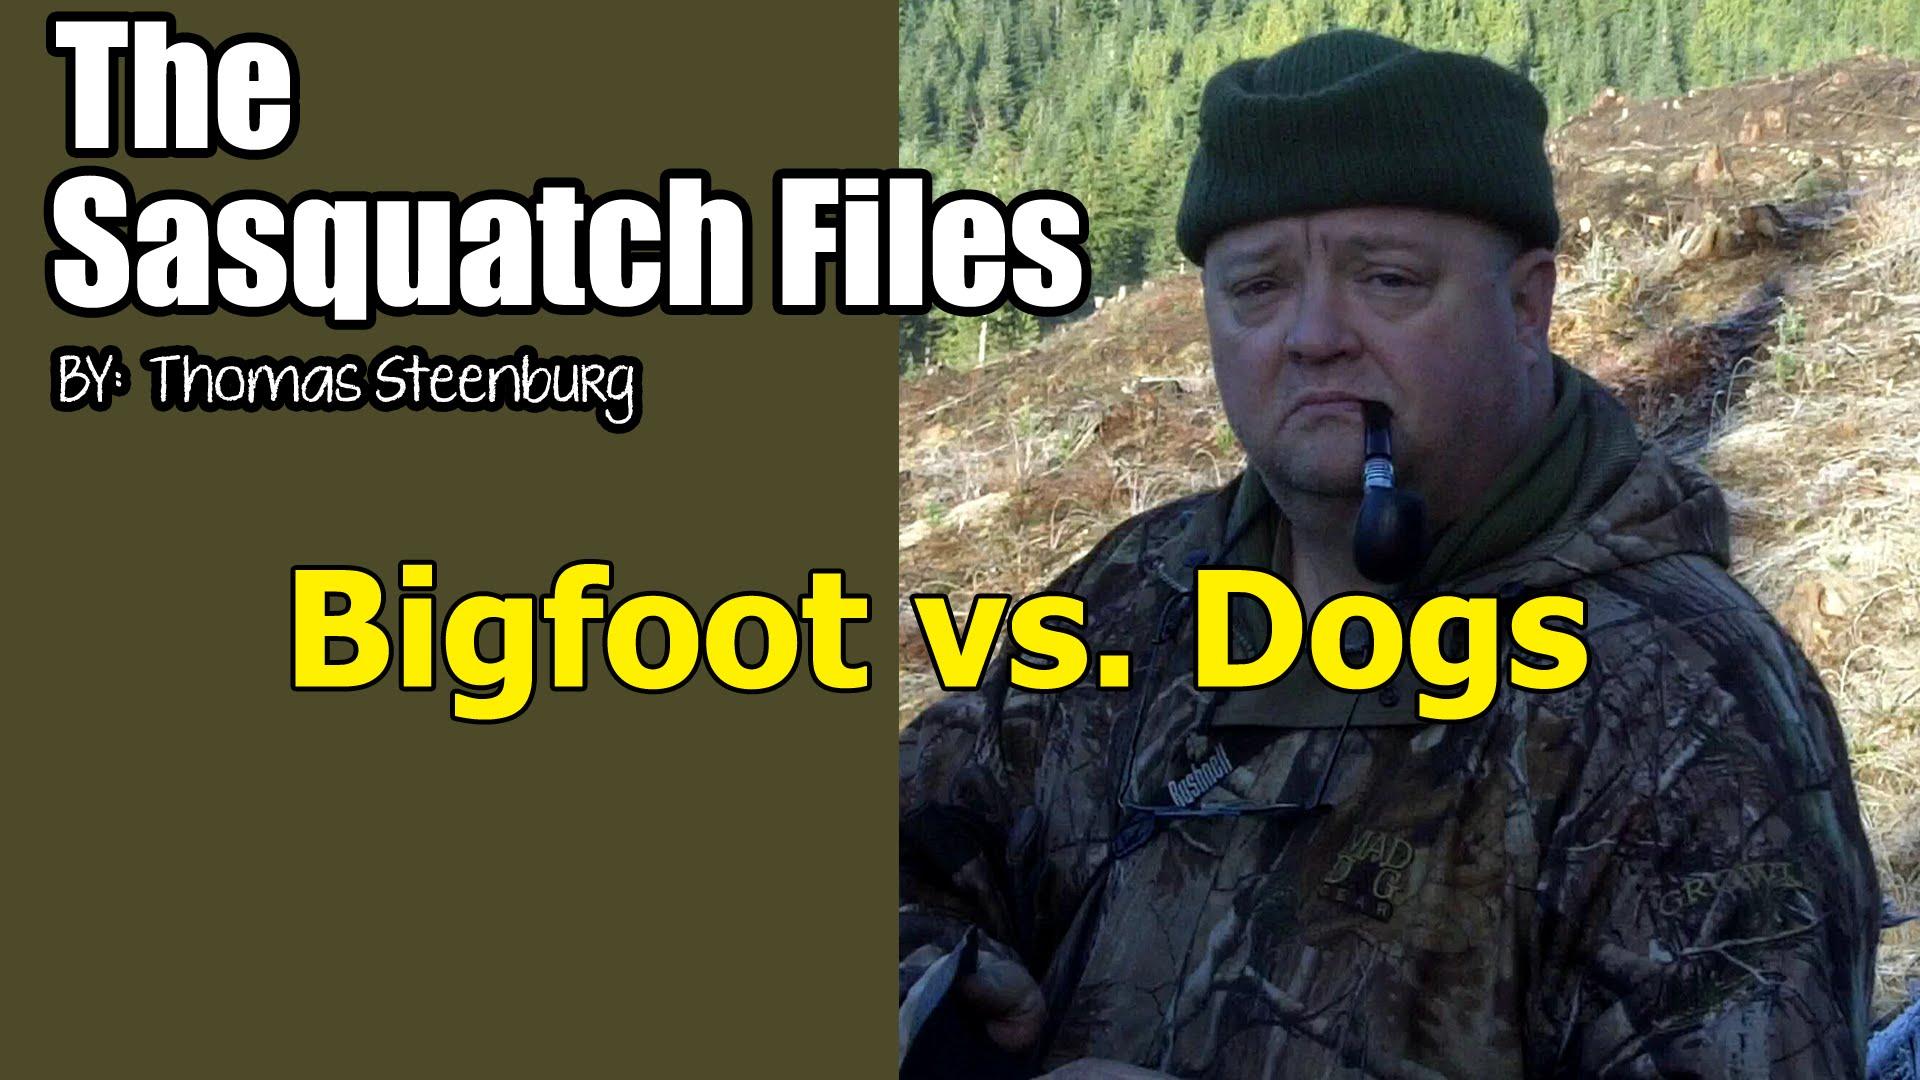 tsf-bigfoot-vs-dogs